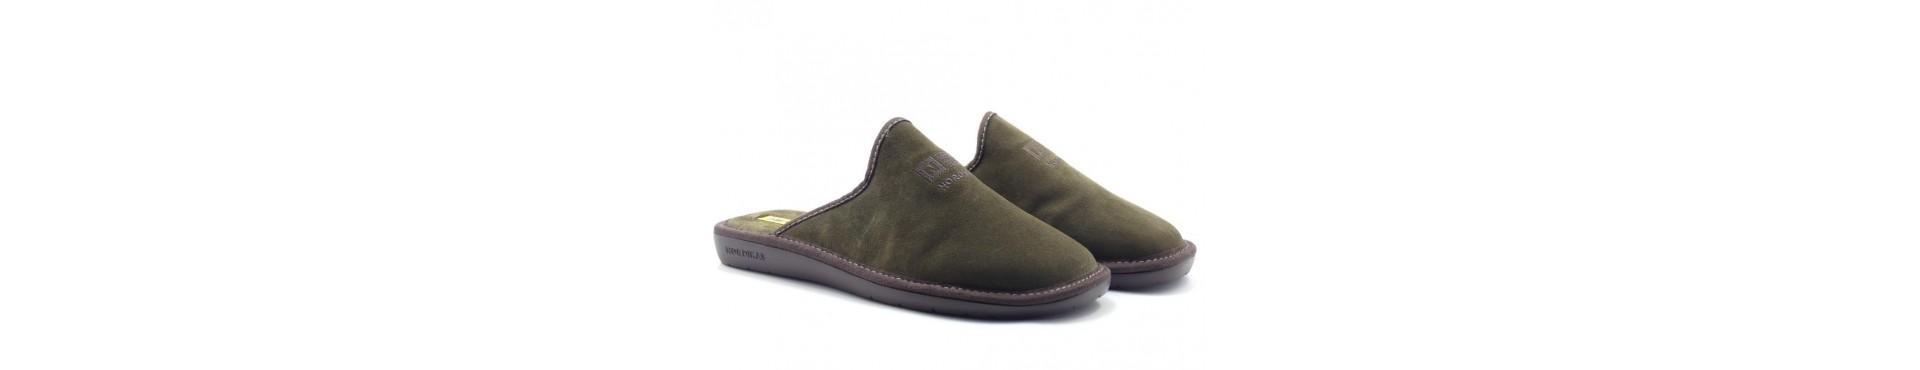 Zapatillas De Estar Por Casa Hombre | Chapo